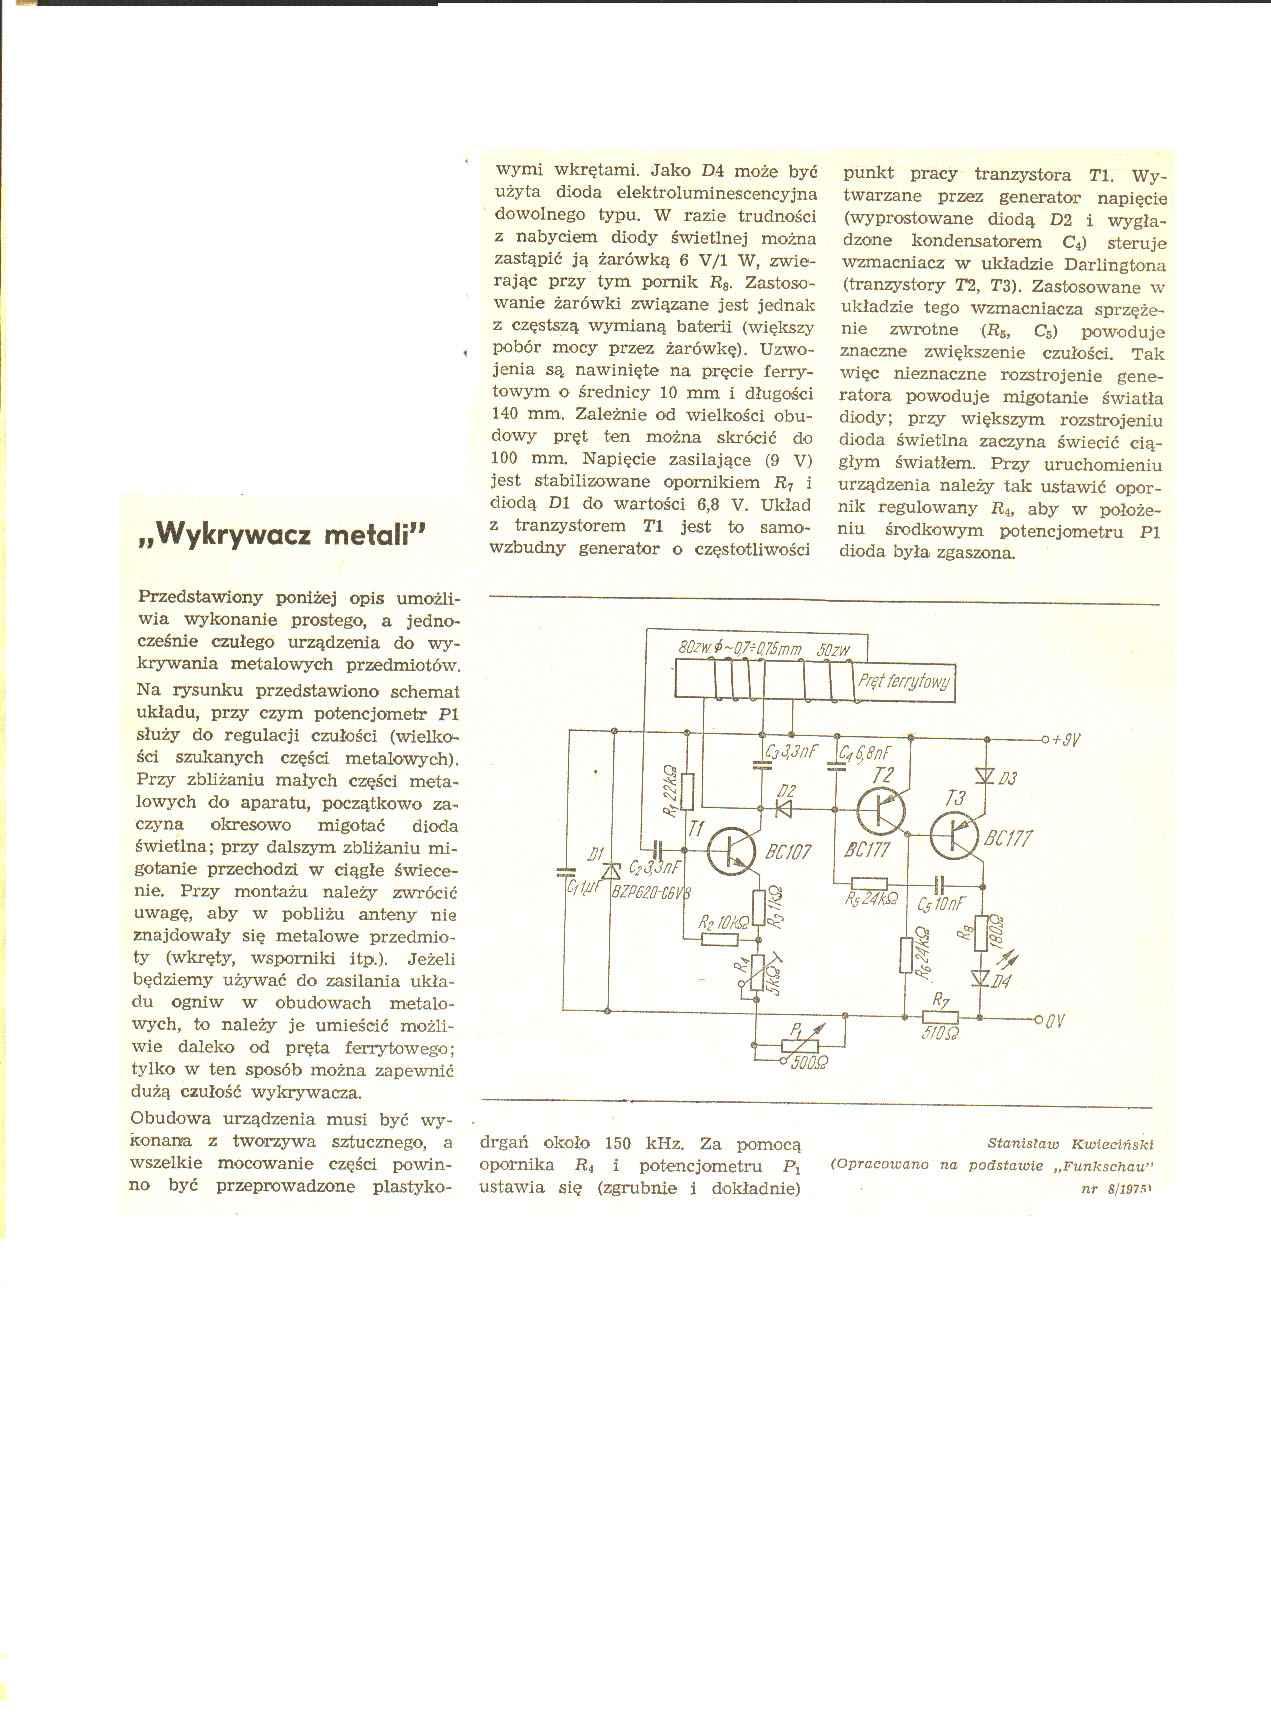 AVT1104 - Wykrywacz metalu, kilka pyta�